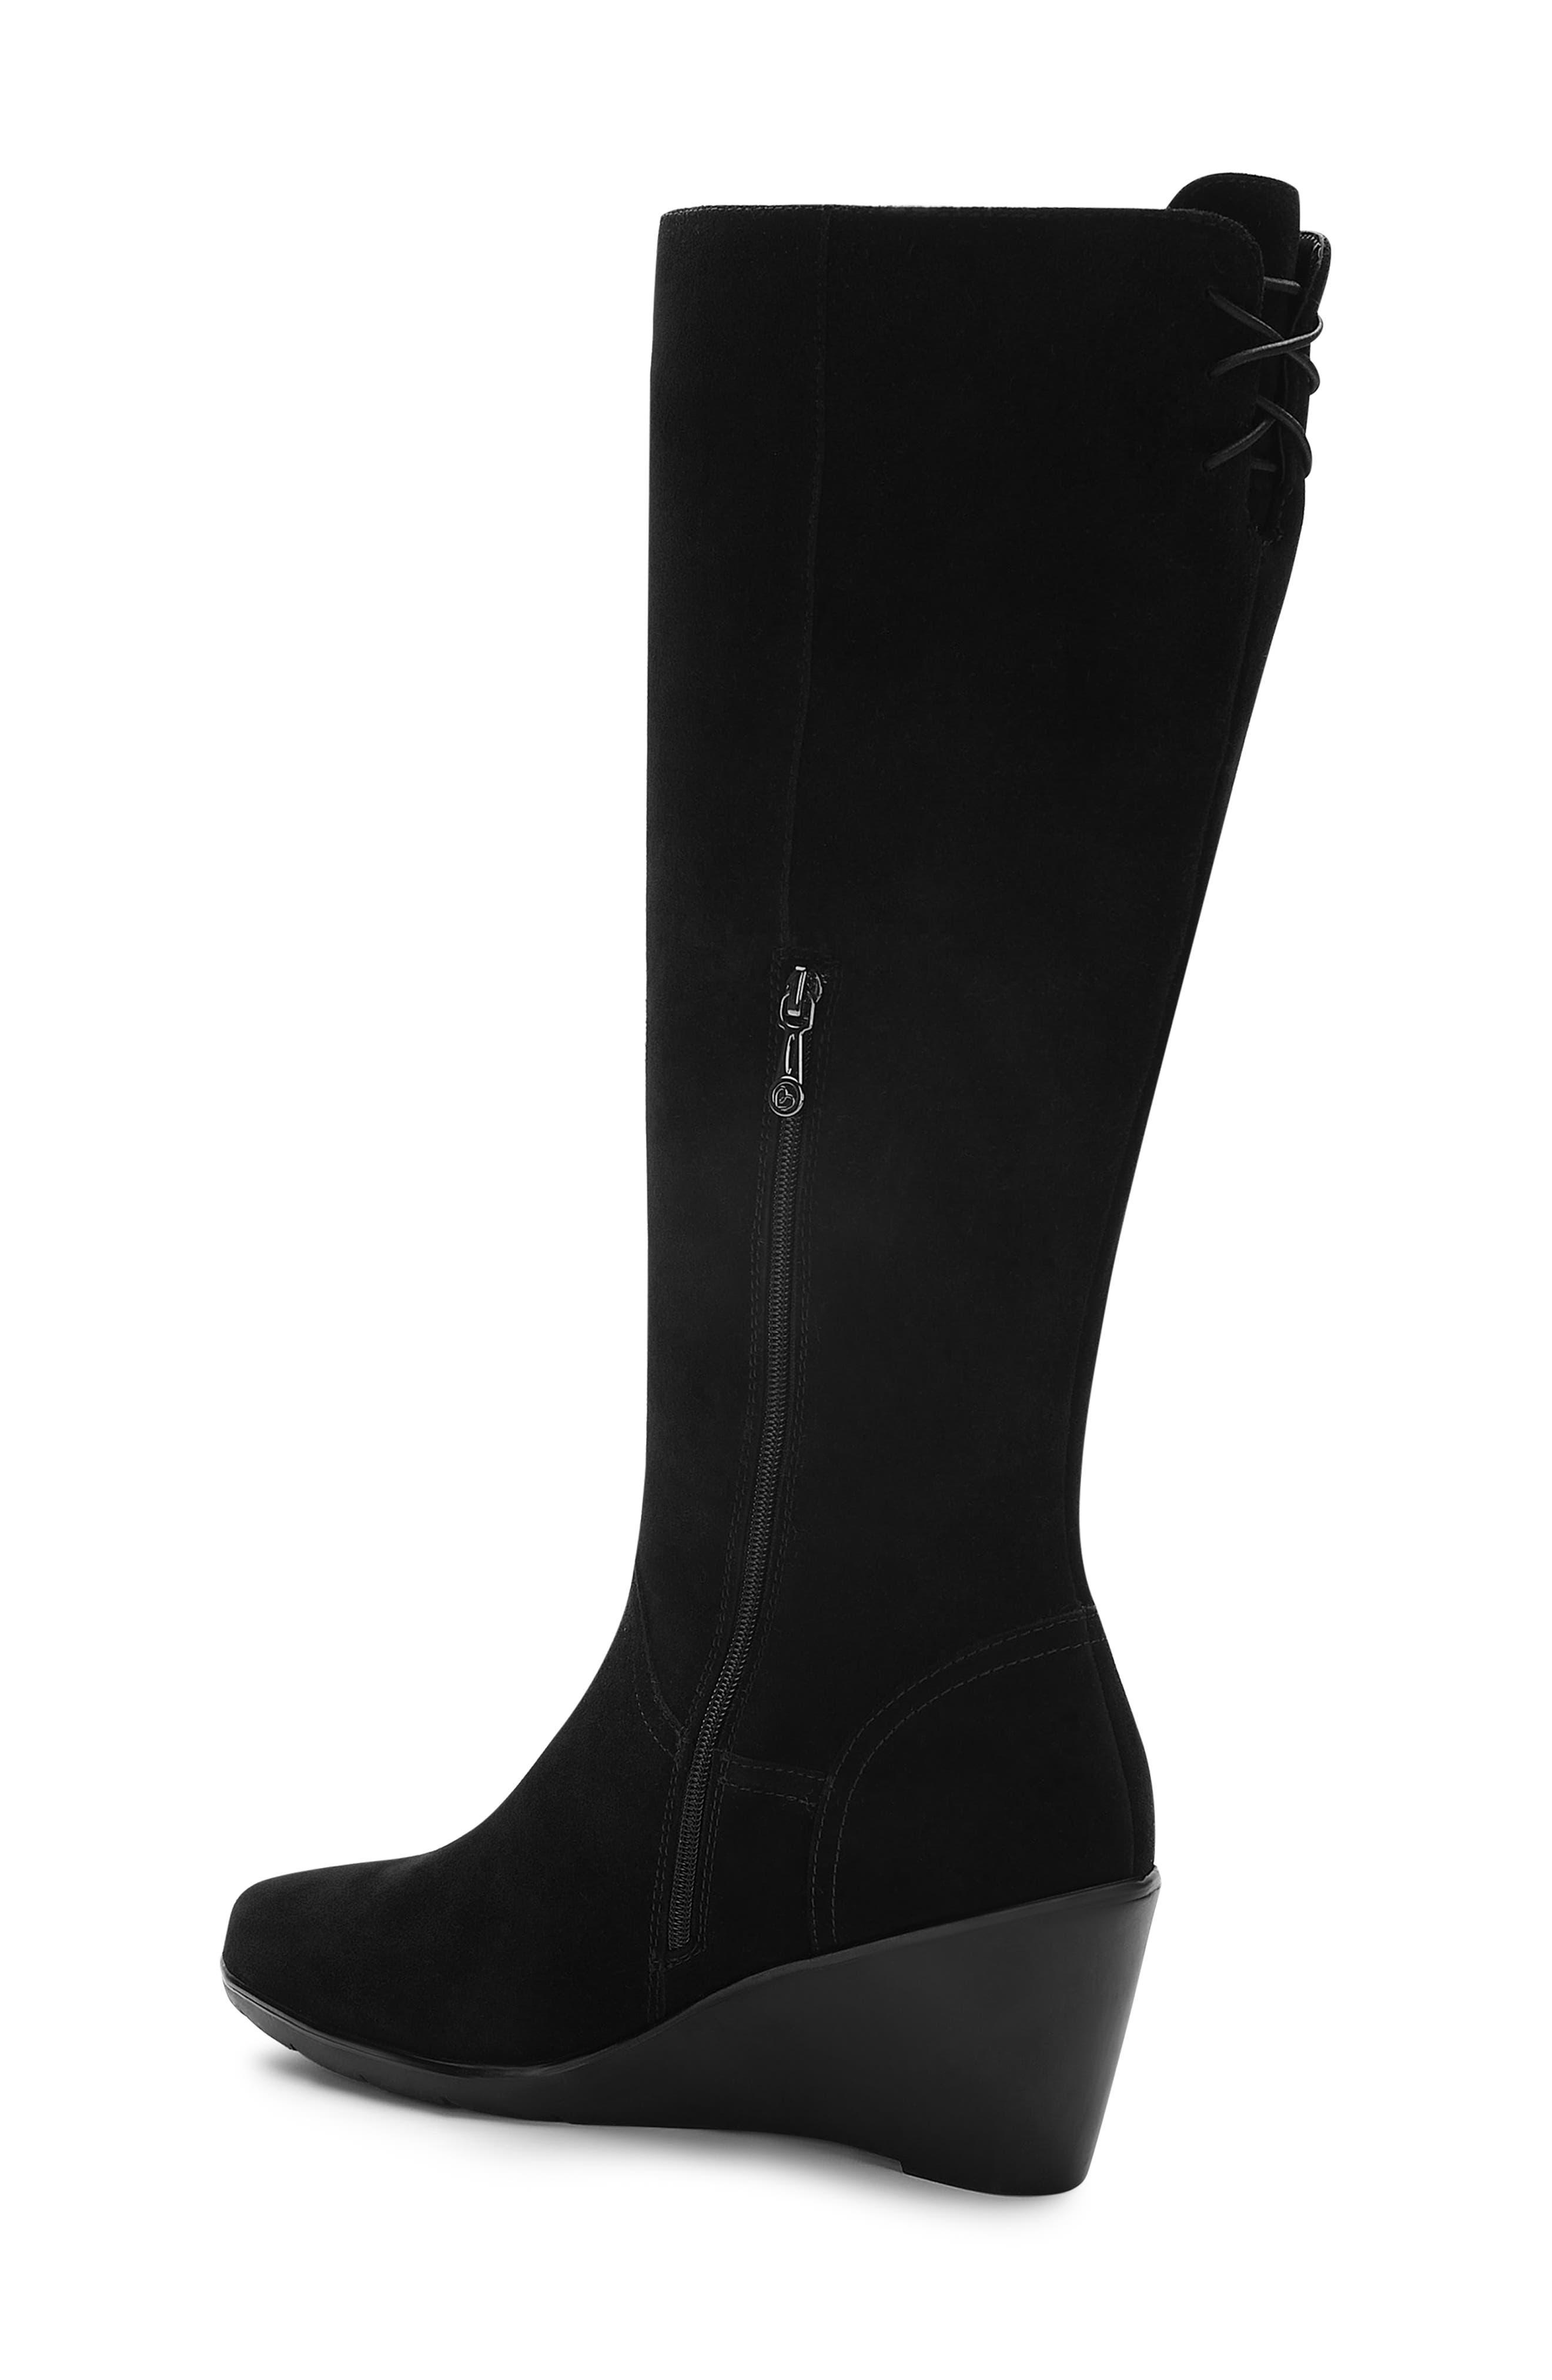 BLONDO, Larissa Waterproof Wedge Knee High Boot, Alternate thumbnail 2, color, BLACK SUEDE